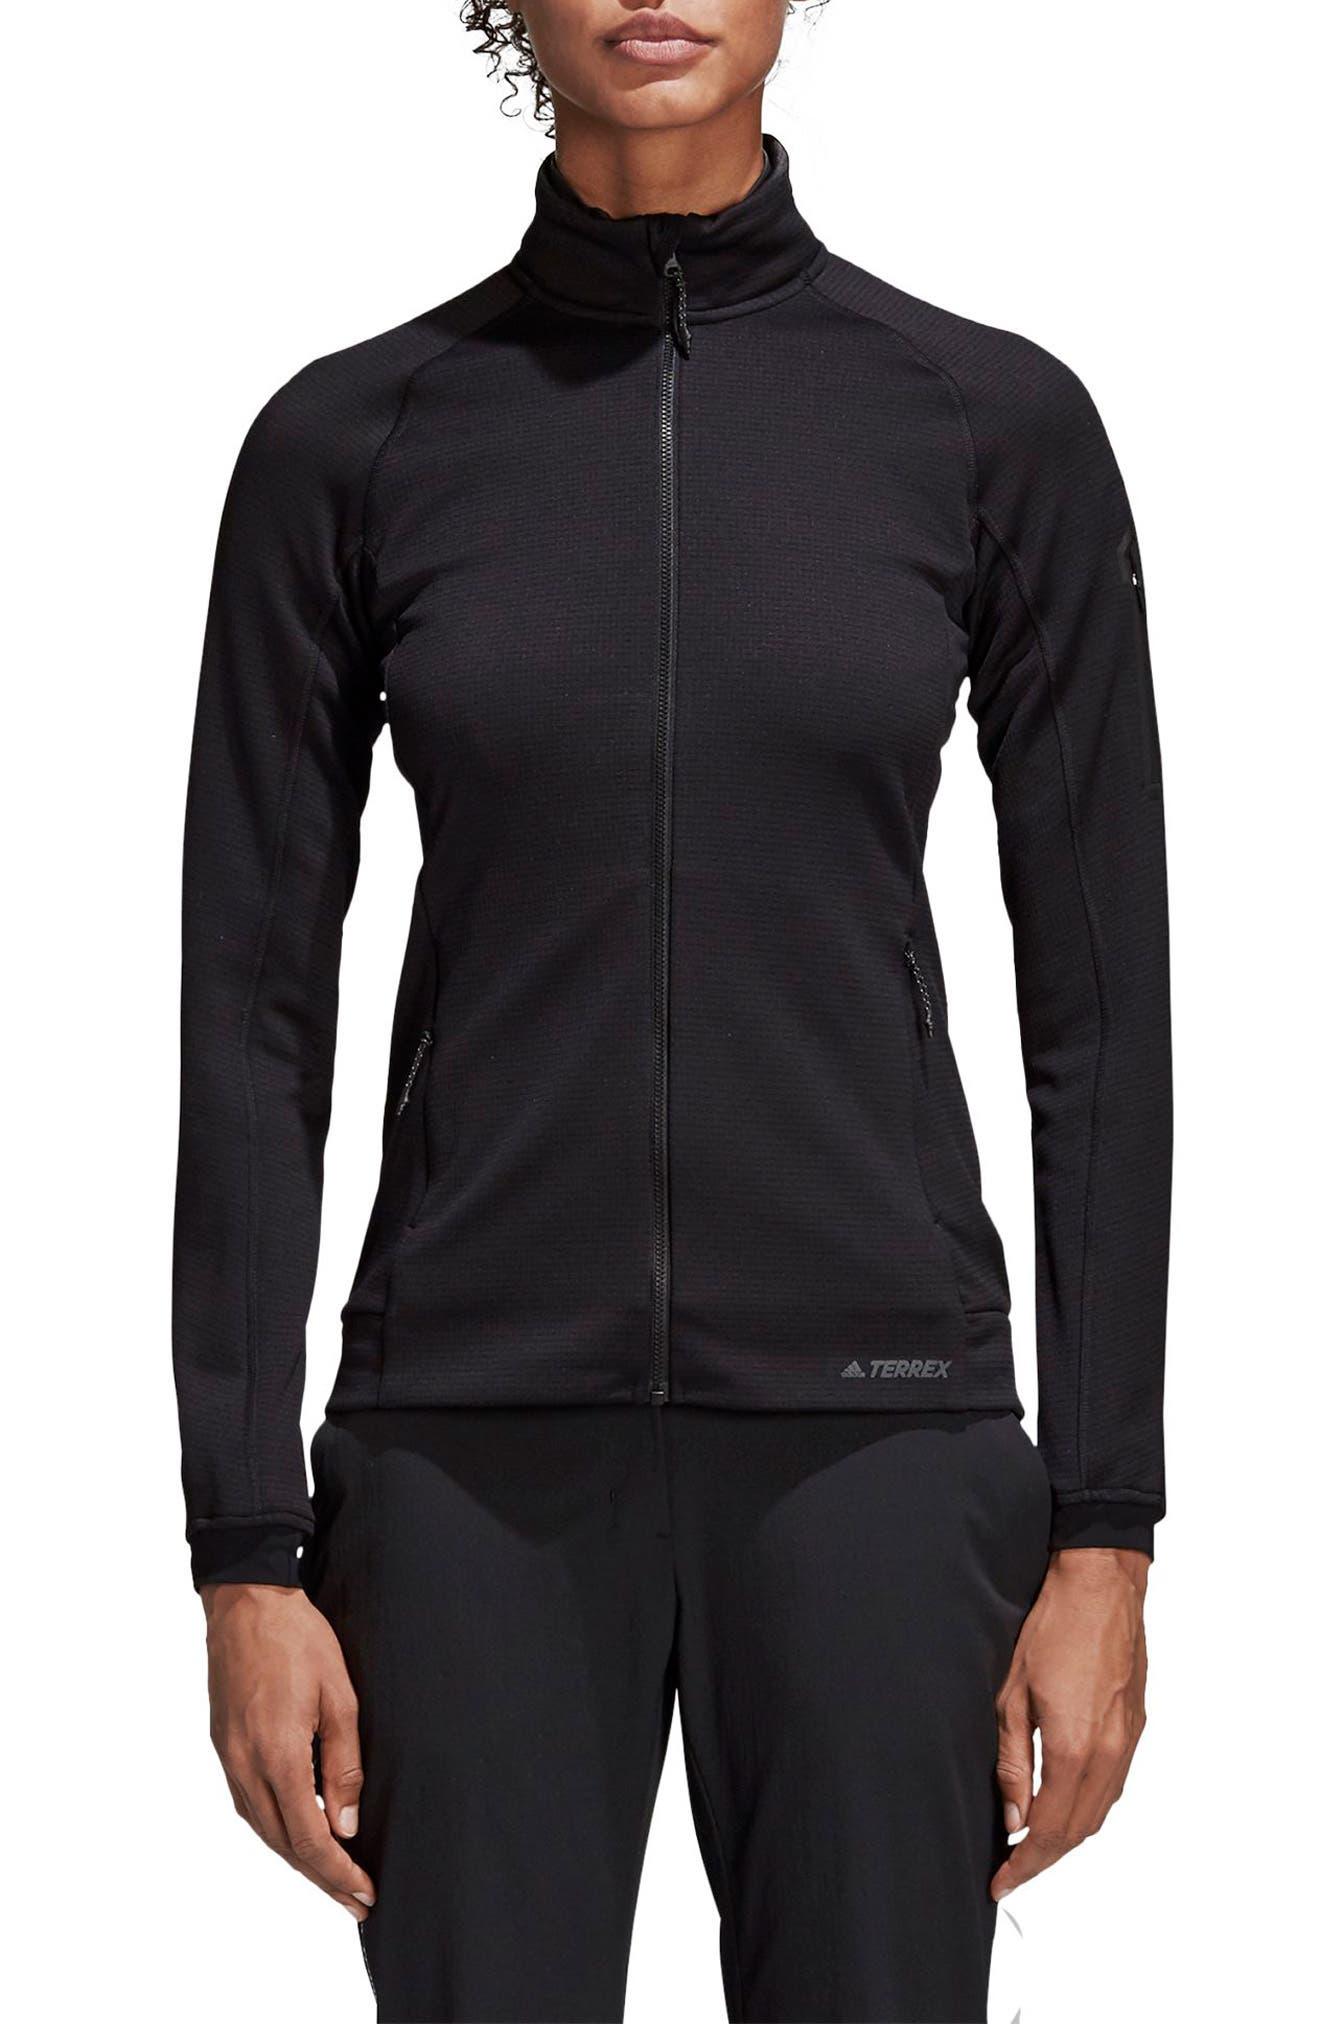 ADIDAS, Stockhorn Fleece Jacket, Main thumbnail 1, color, BLACK